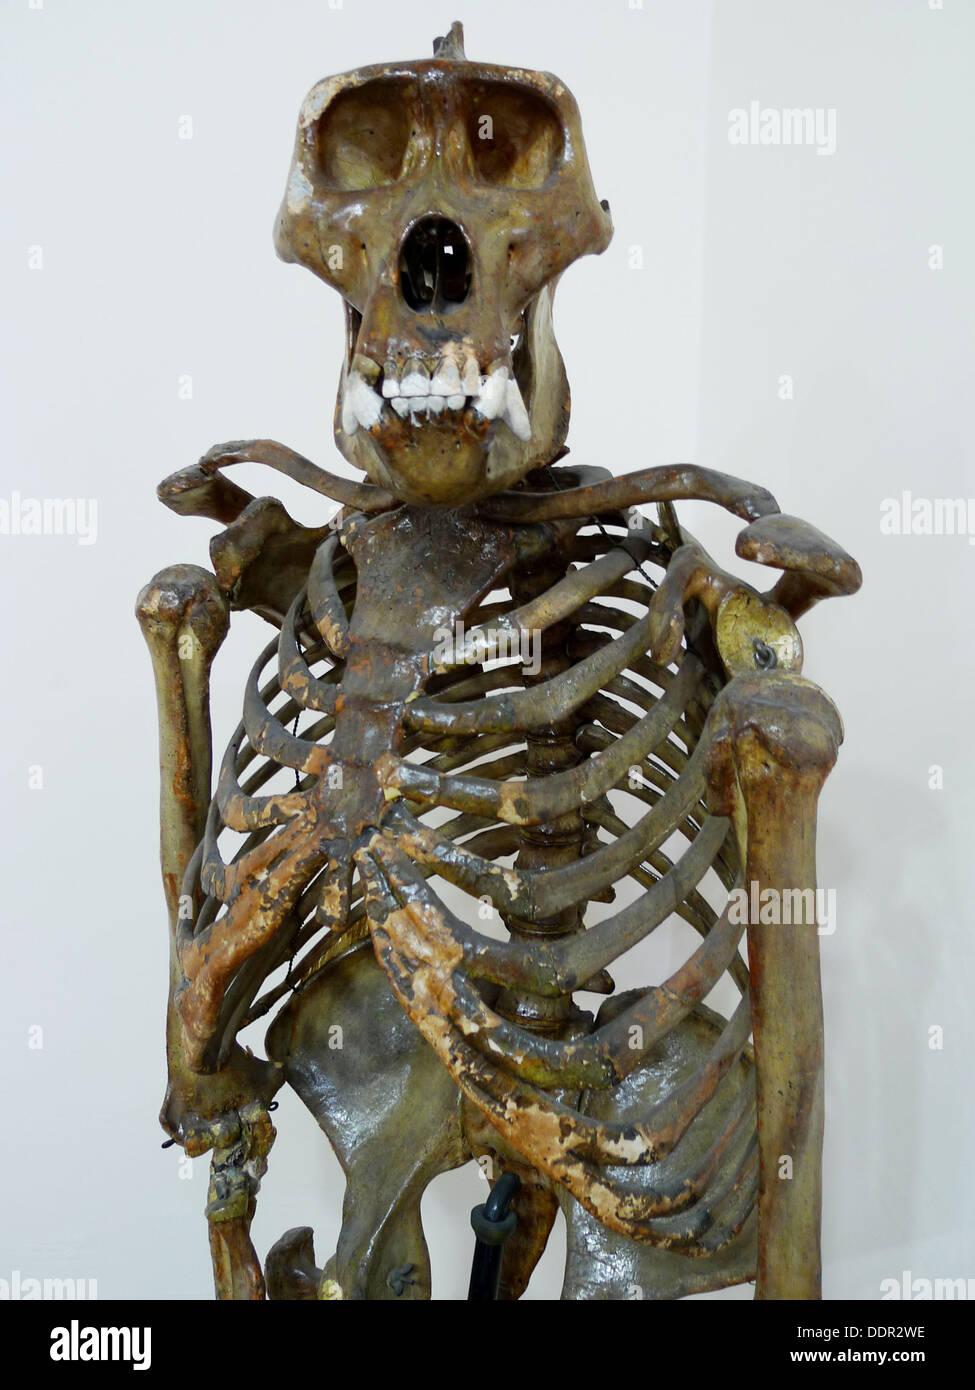 Skeleton Skeleton Gorilla Imágenes De Stock & Skeleton Skeleton ...